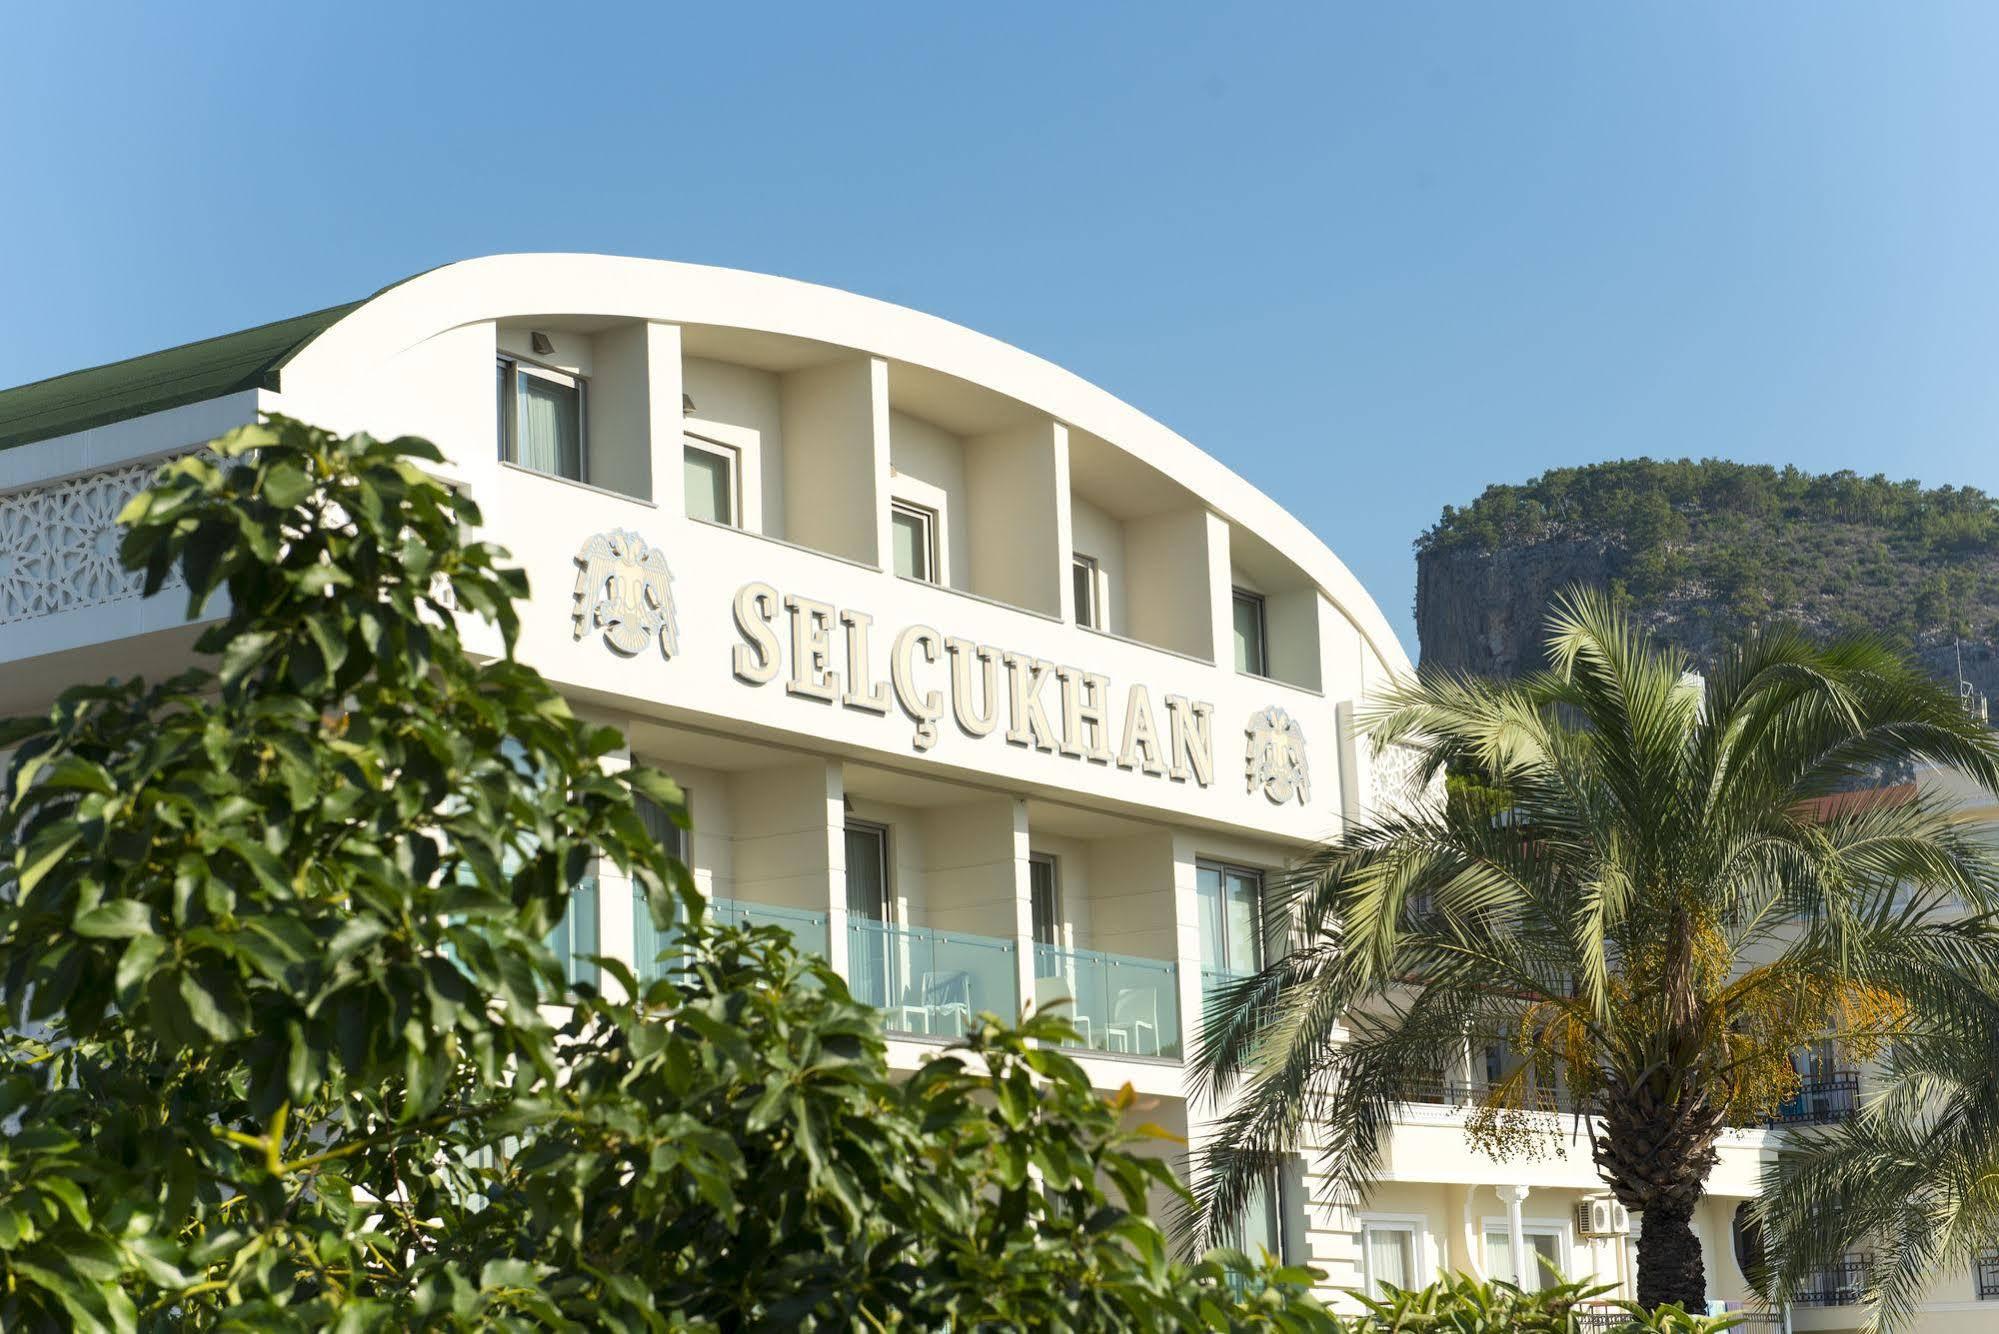 Selcukhan Hotel